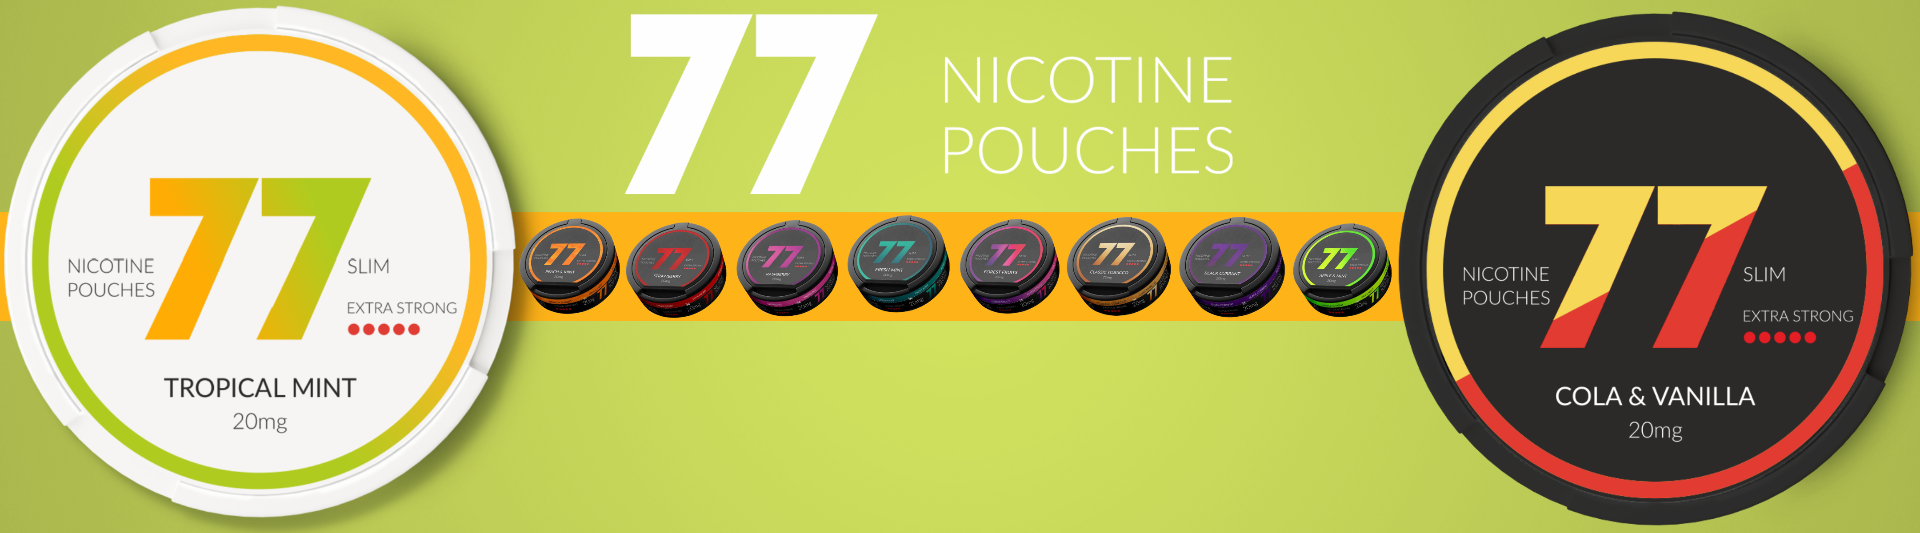 77 pouches at Snus24